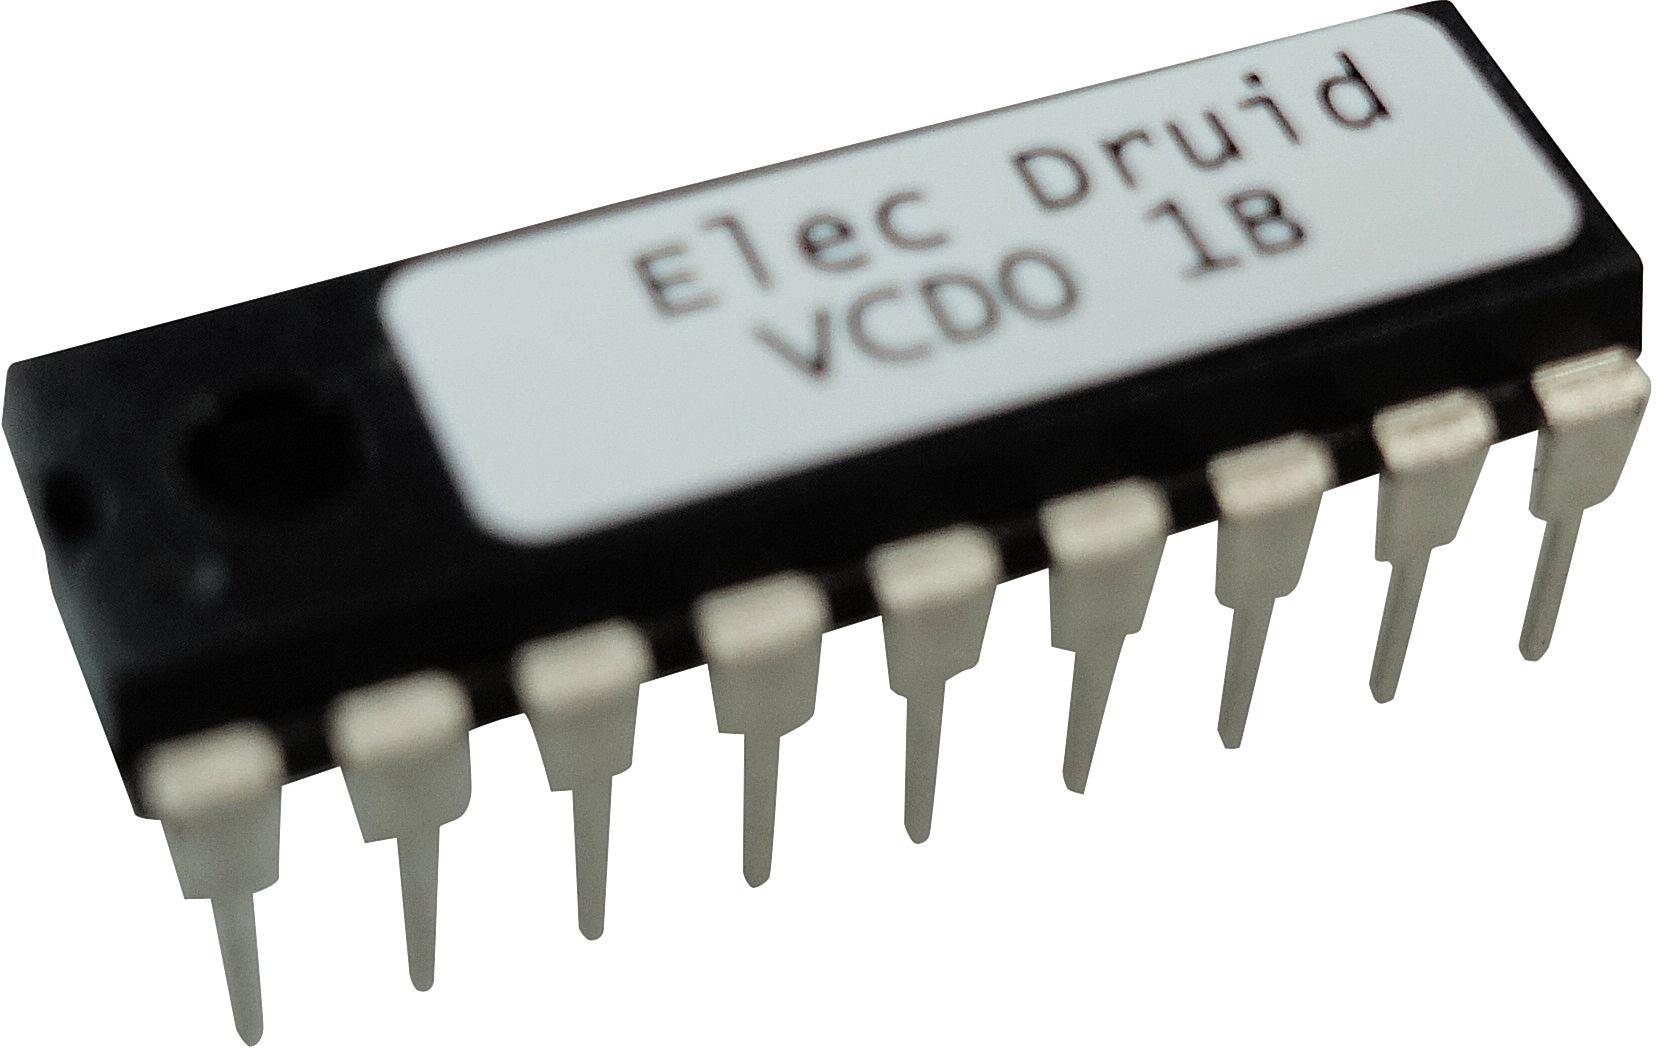 electric druid vcdo wavetable oscillator delay chips clock ics chips ics opamps. Black Bedroom Furniture Sets. Home Design Ideas